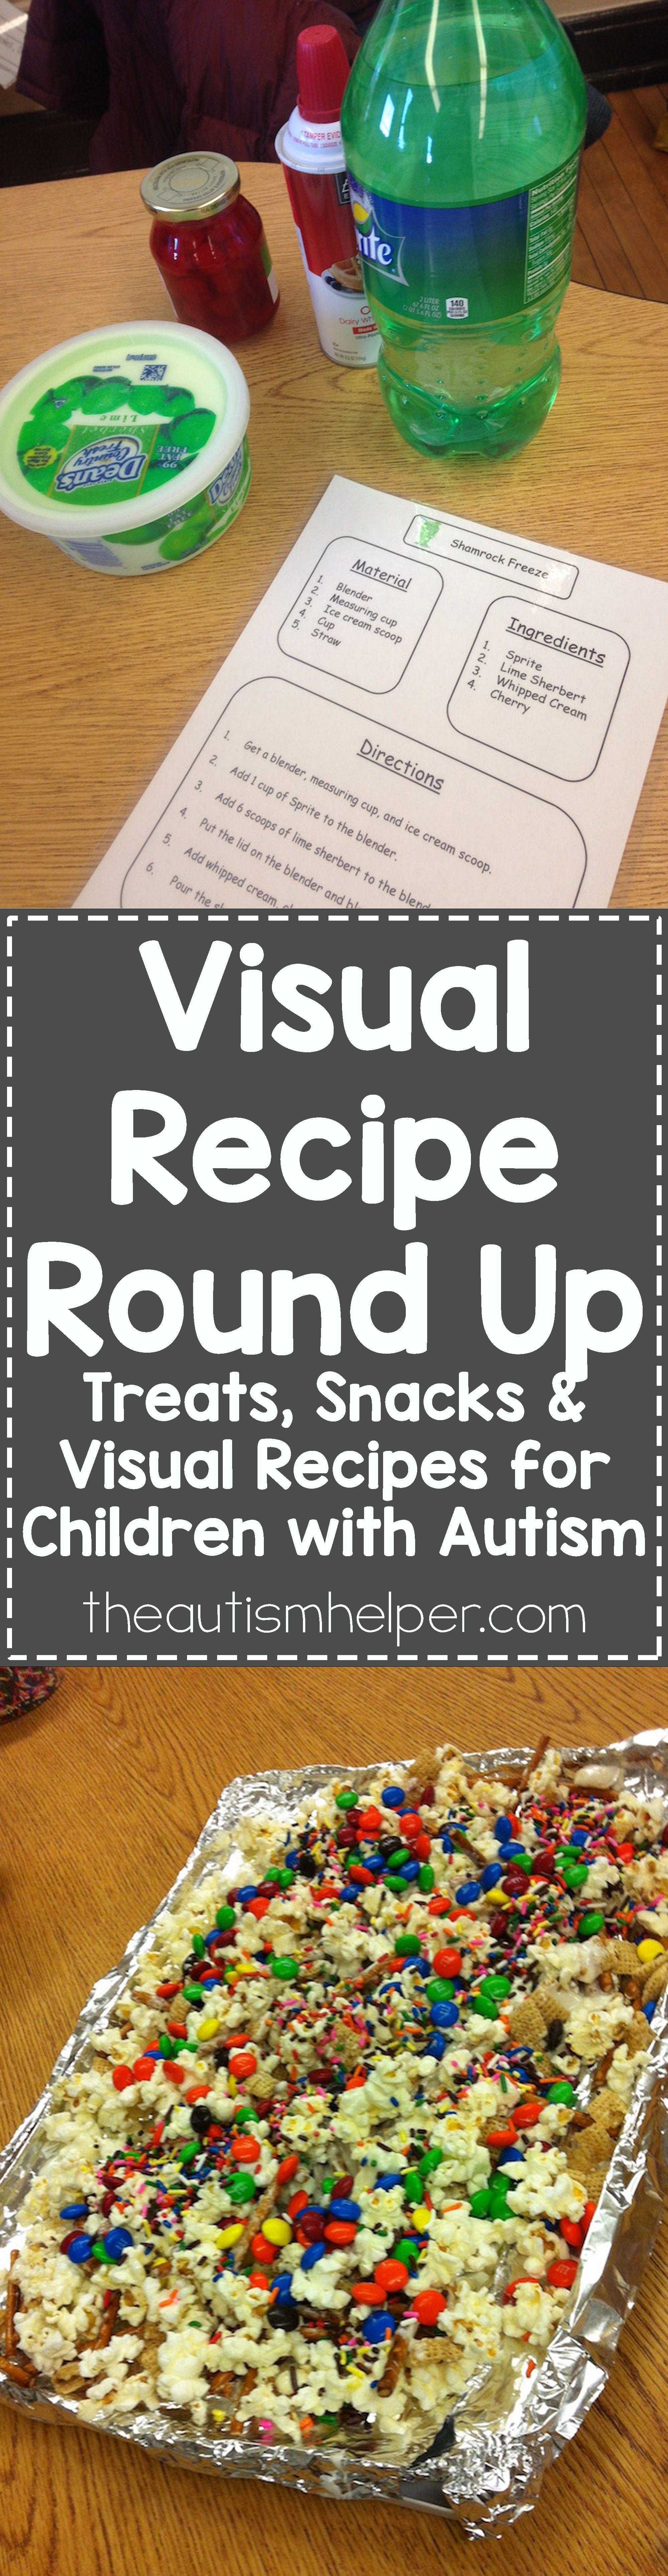 Visual Recipe Round Up